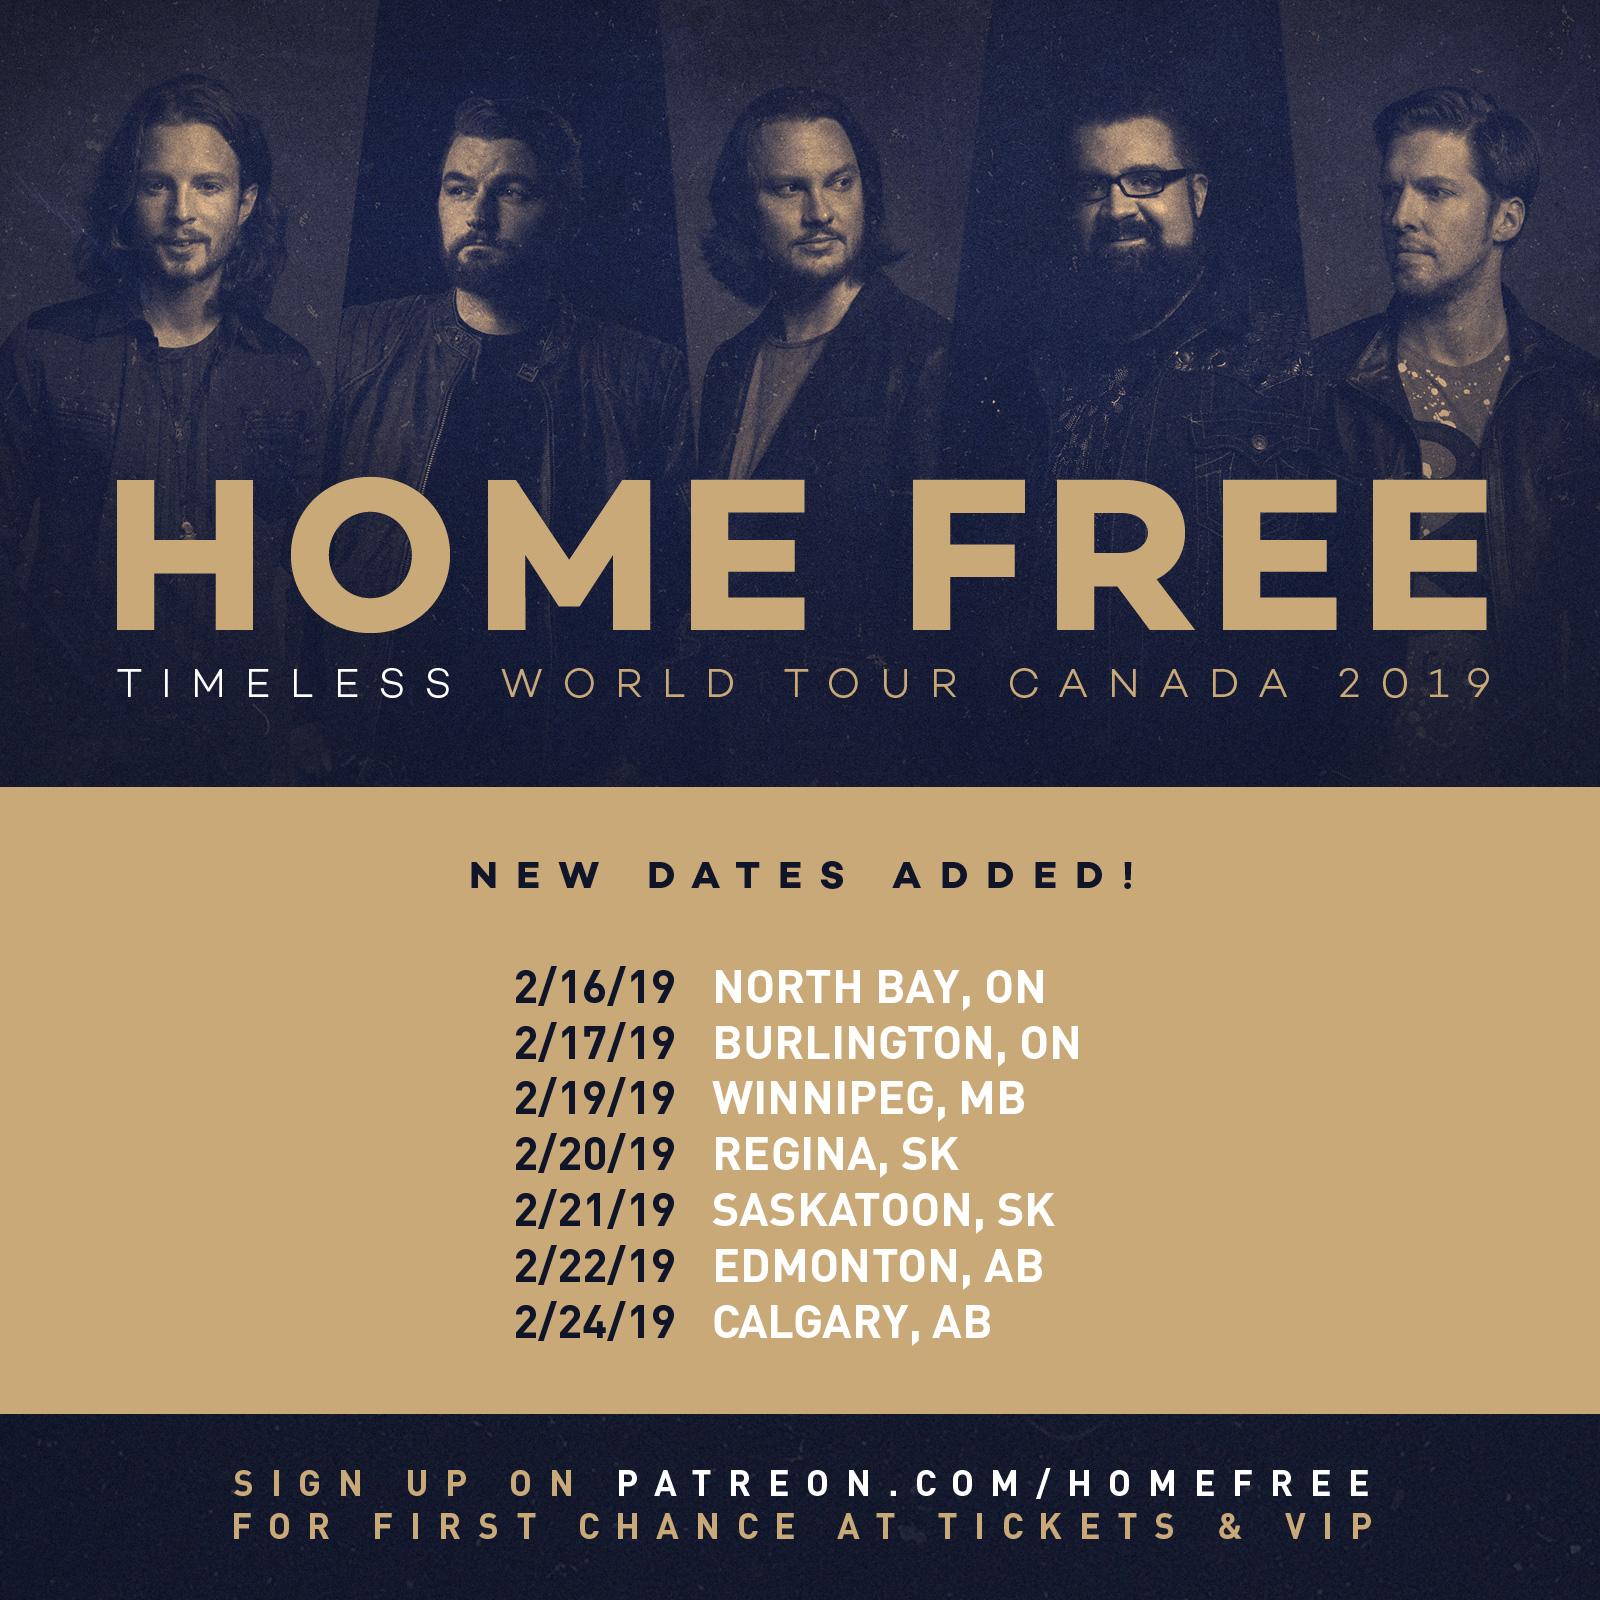 logo-home-free-world-tour-2019